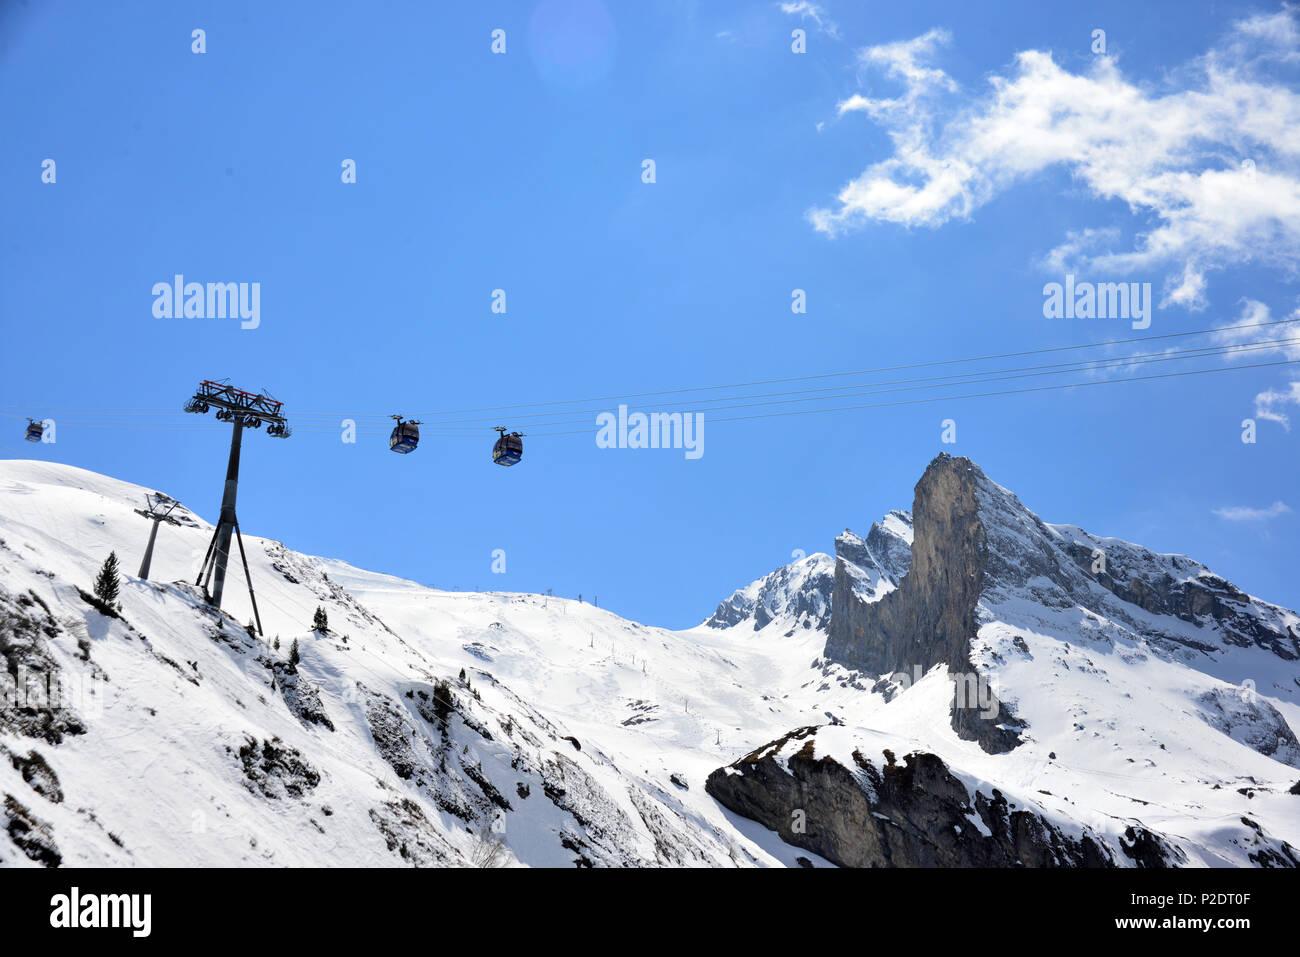 Ski area at Hintertux glacier, Tux valley, Tyrol, Austria - Stock Image